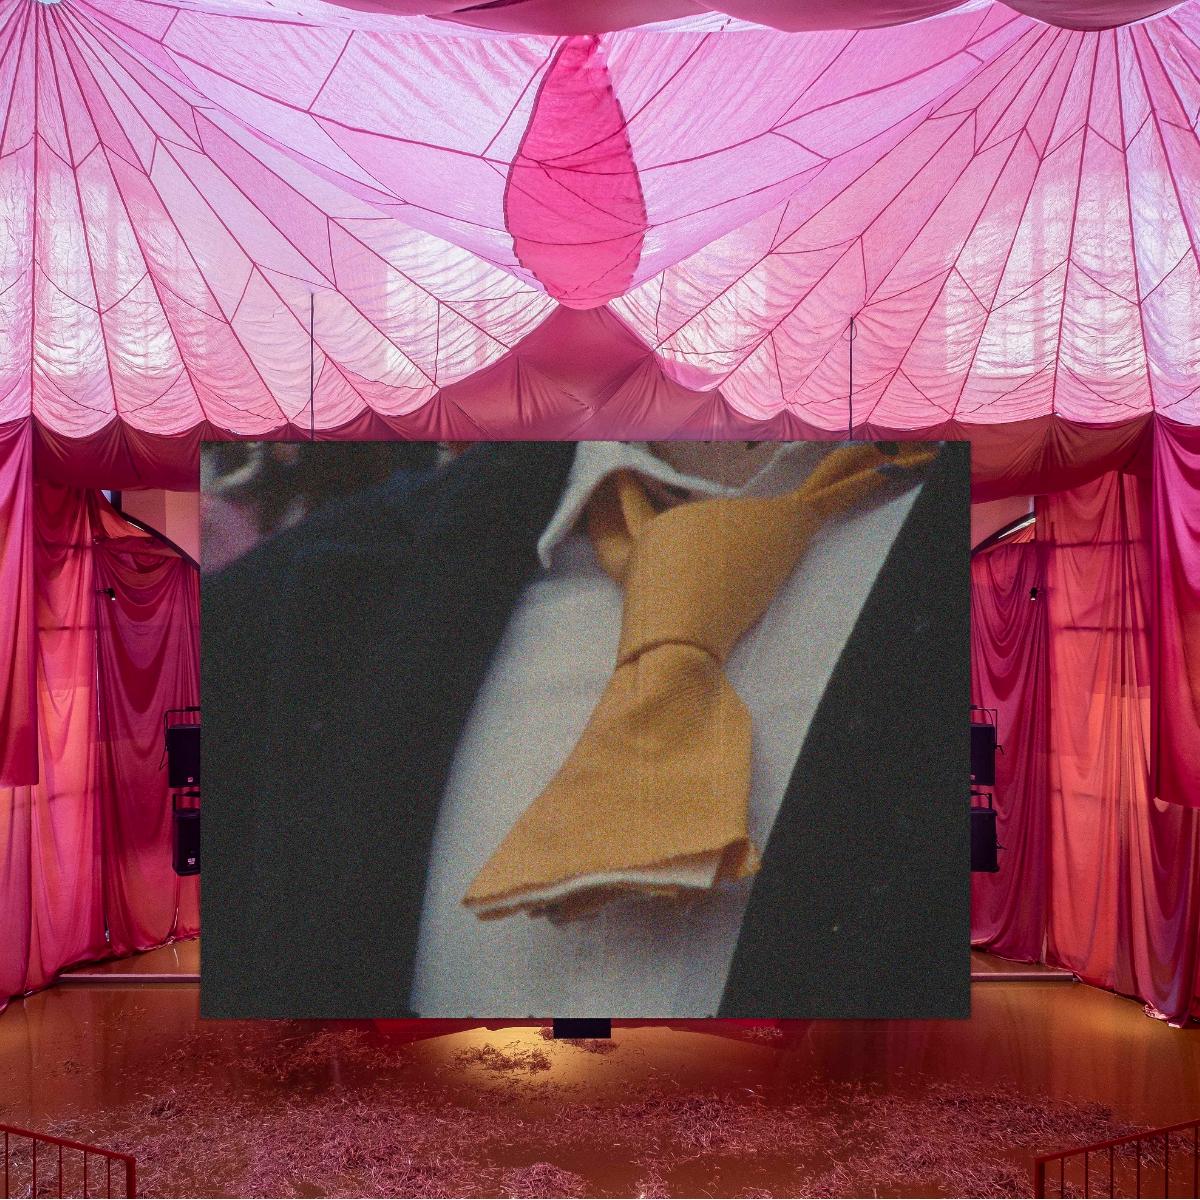 Pauline Curnier Jardin. Fat to Ashes, Ausstellungsansicht Hamburger Bahnhof - Museum fr Gegenwart - Berlin, 2021 (c) Nationalgalerie - Staatliche Museen zu Berlin  VG Bild-Kunst, Bonn 2021  Mathias Vlzke (1)